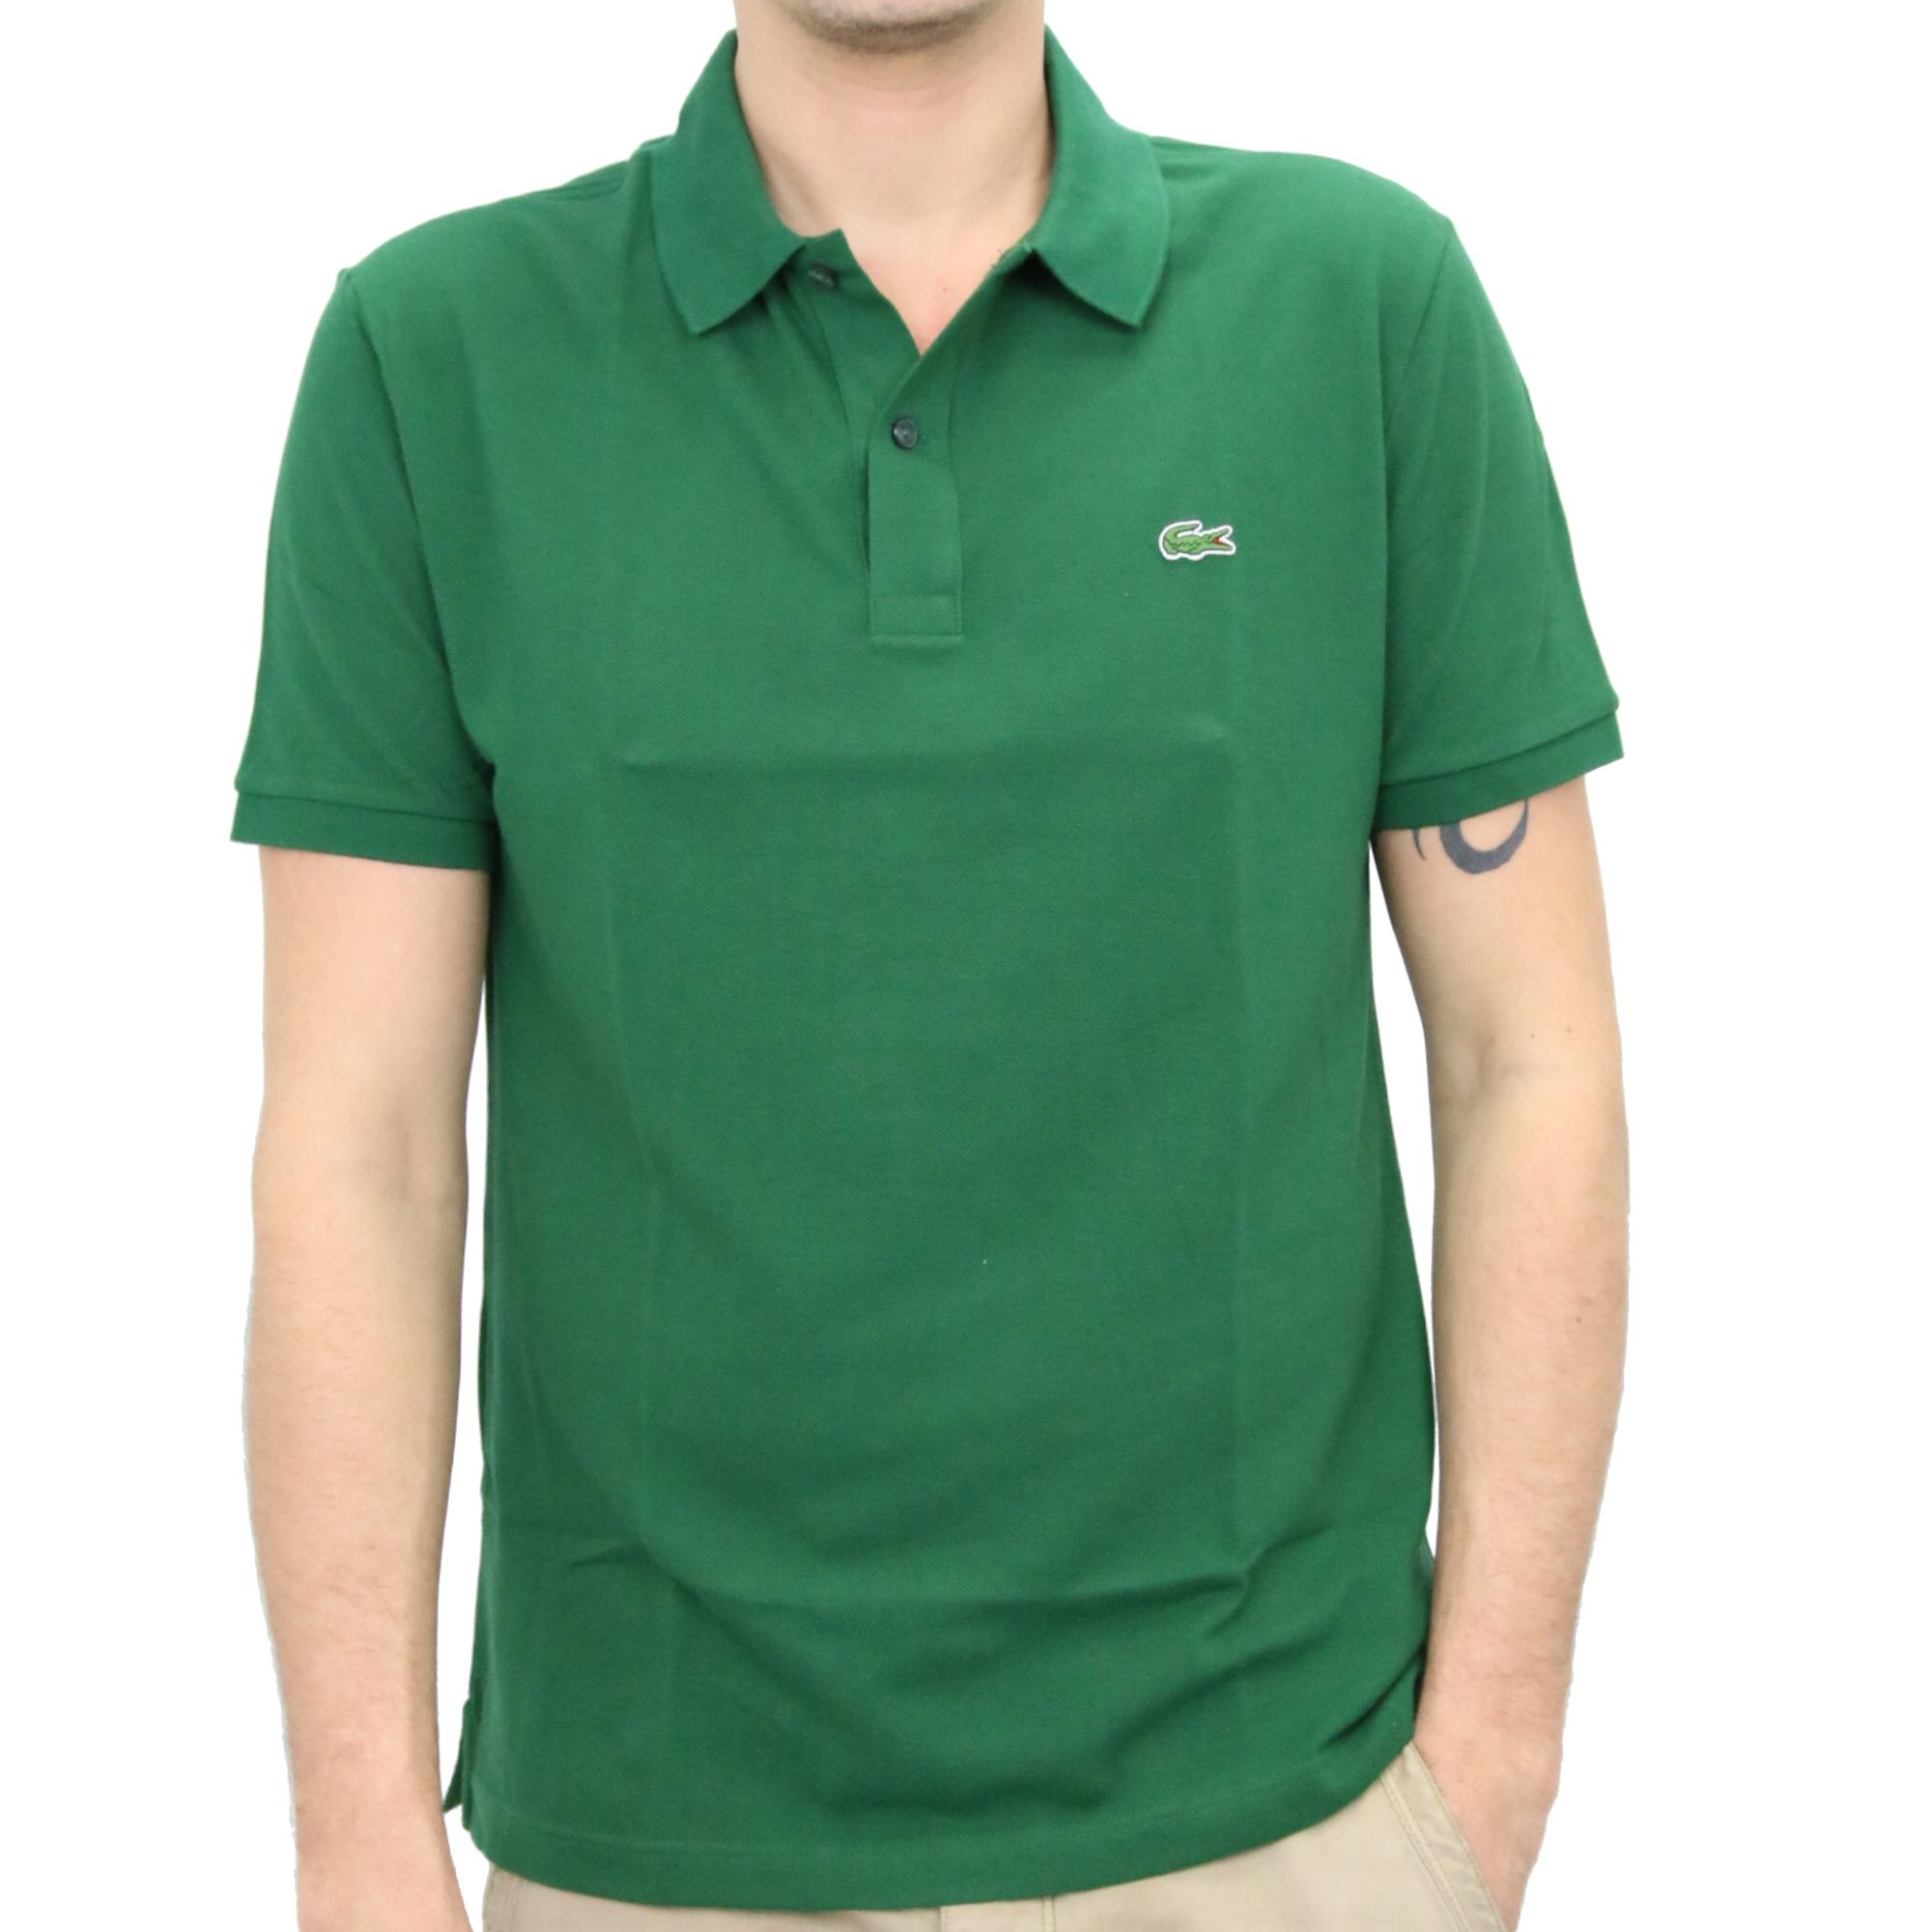 Lacoste slim fit polo poloshirt polohemd t shirt kurzarm for Lacoste polo shirts ebay